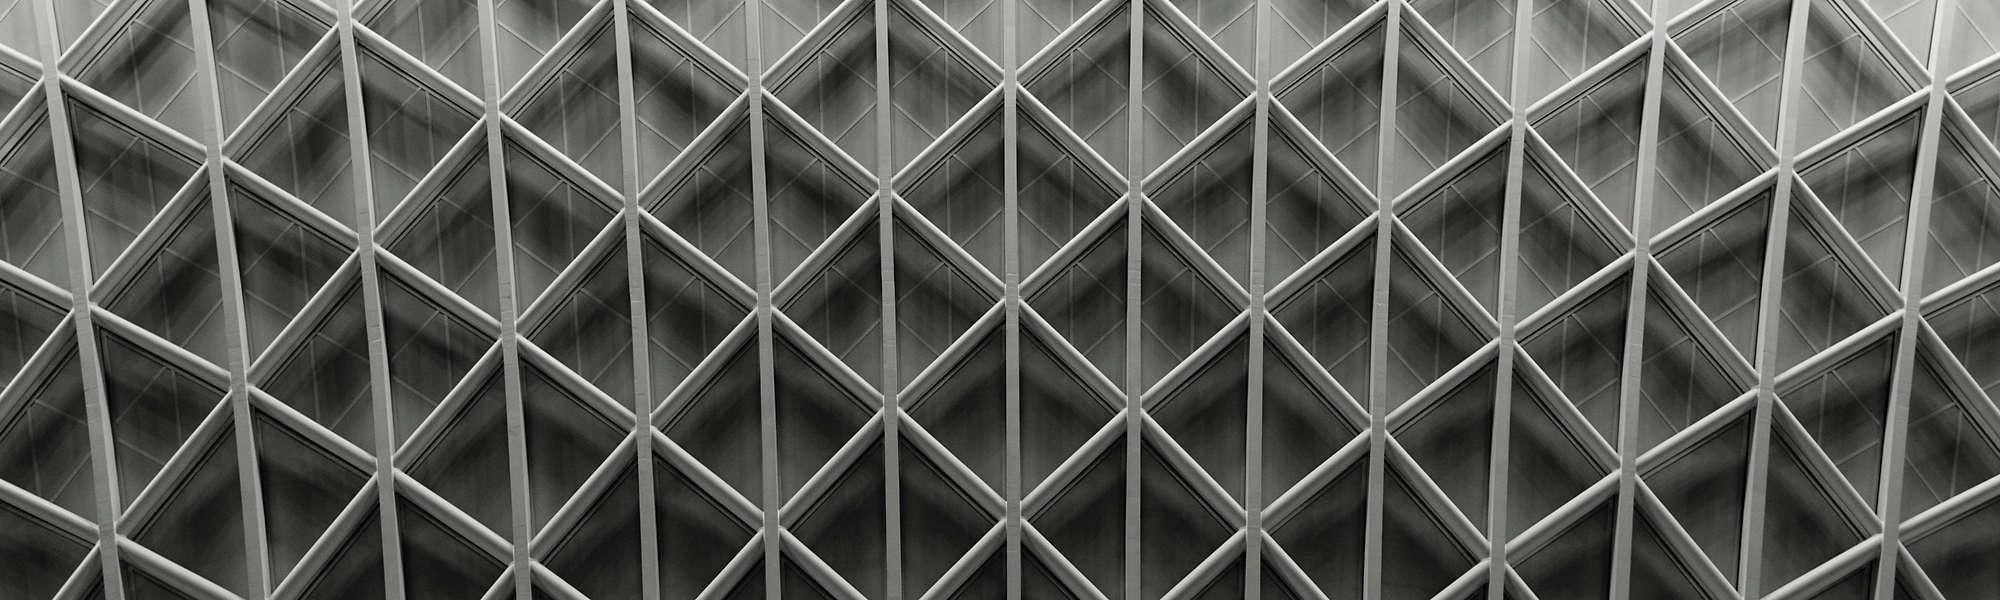 Triangular architectural feature